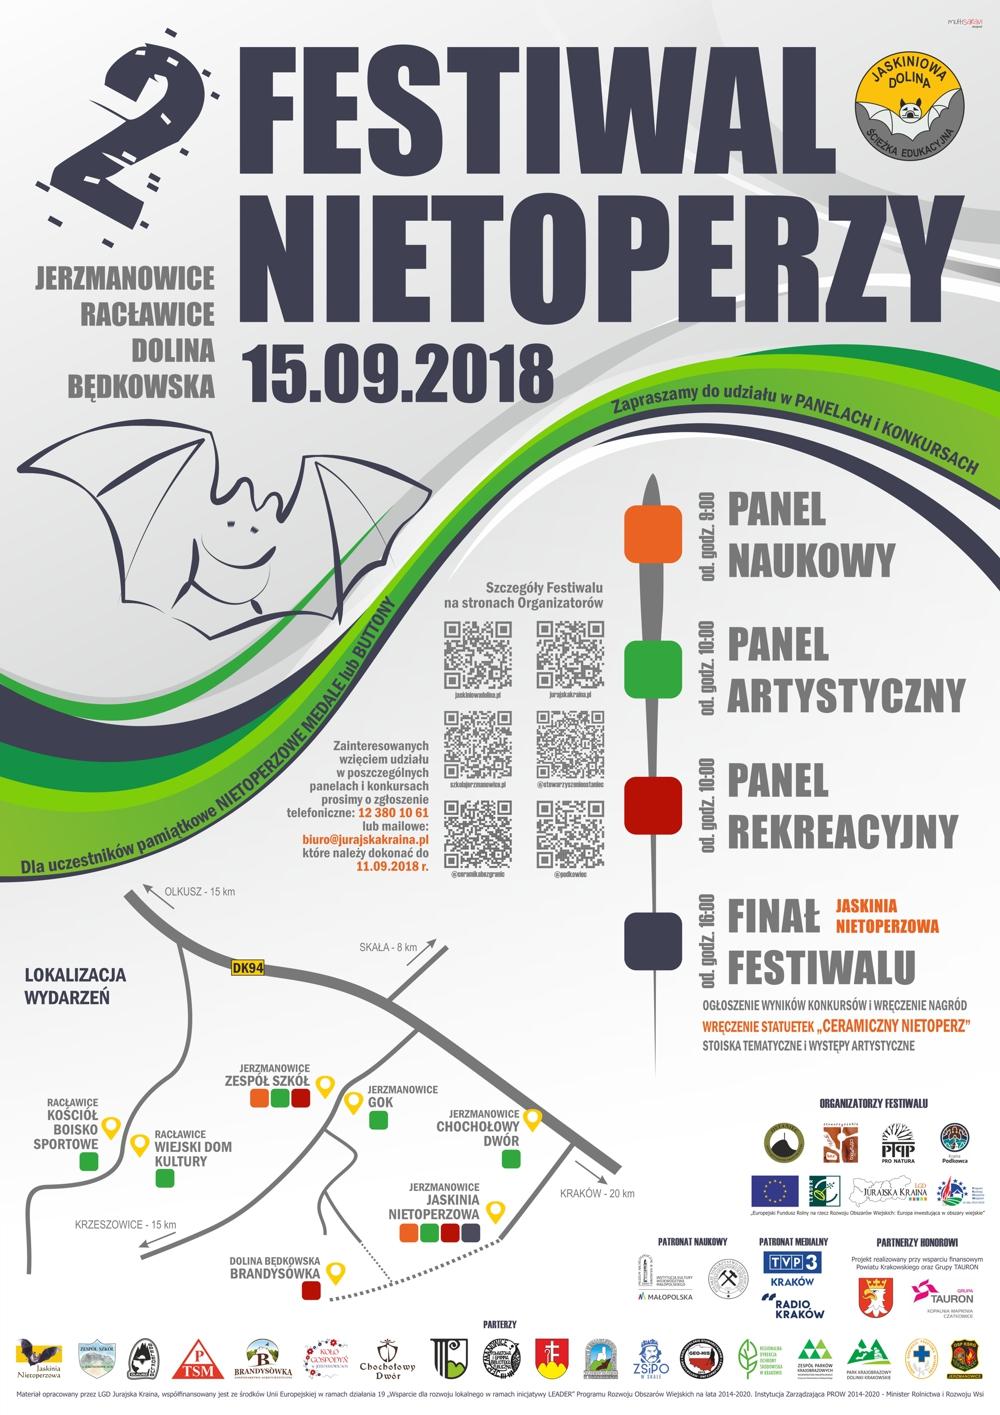 2 Festiwal Nietoperzy